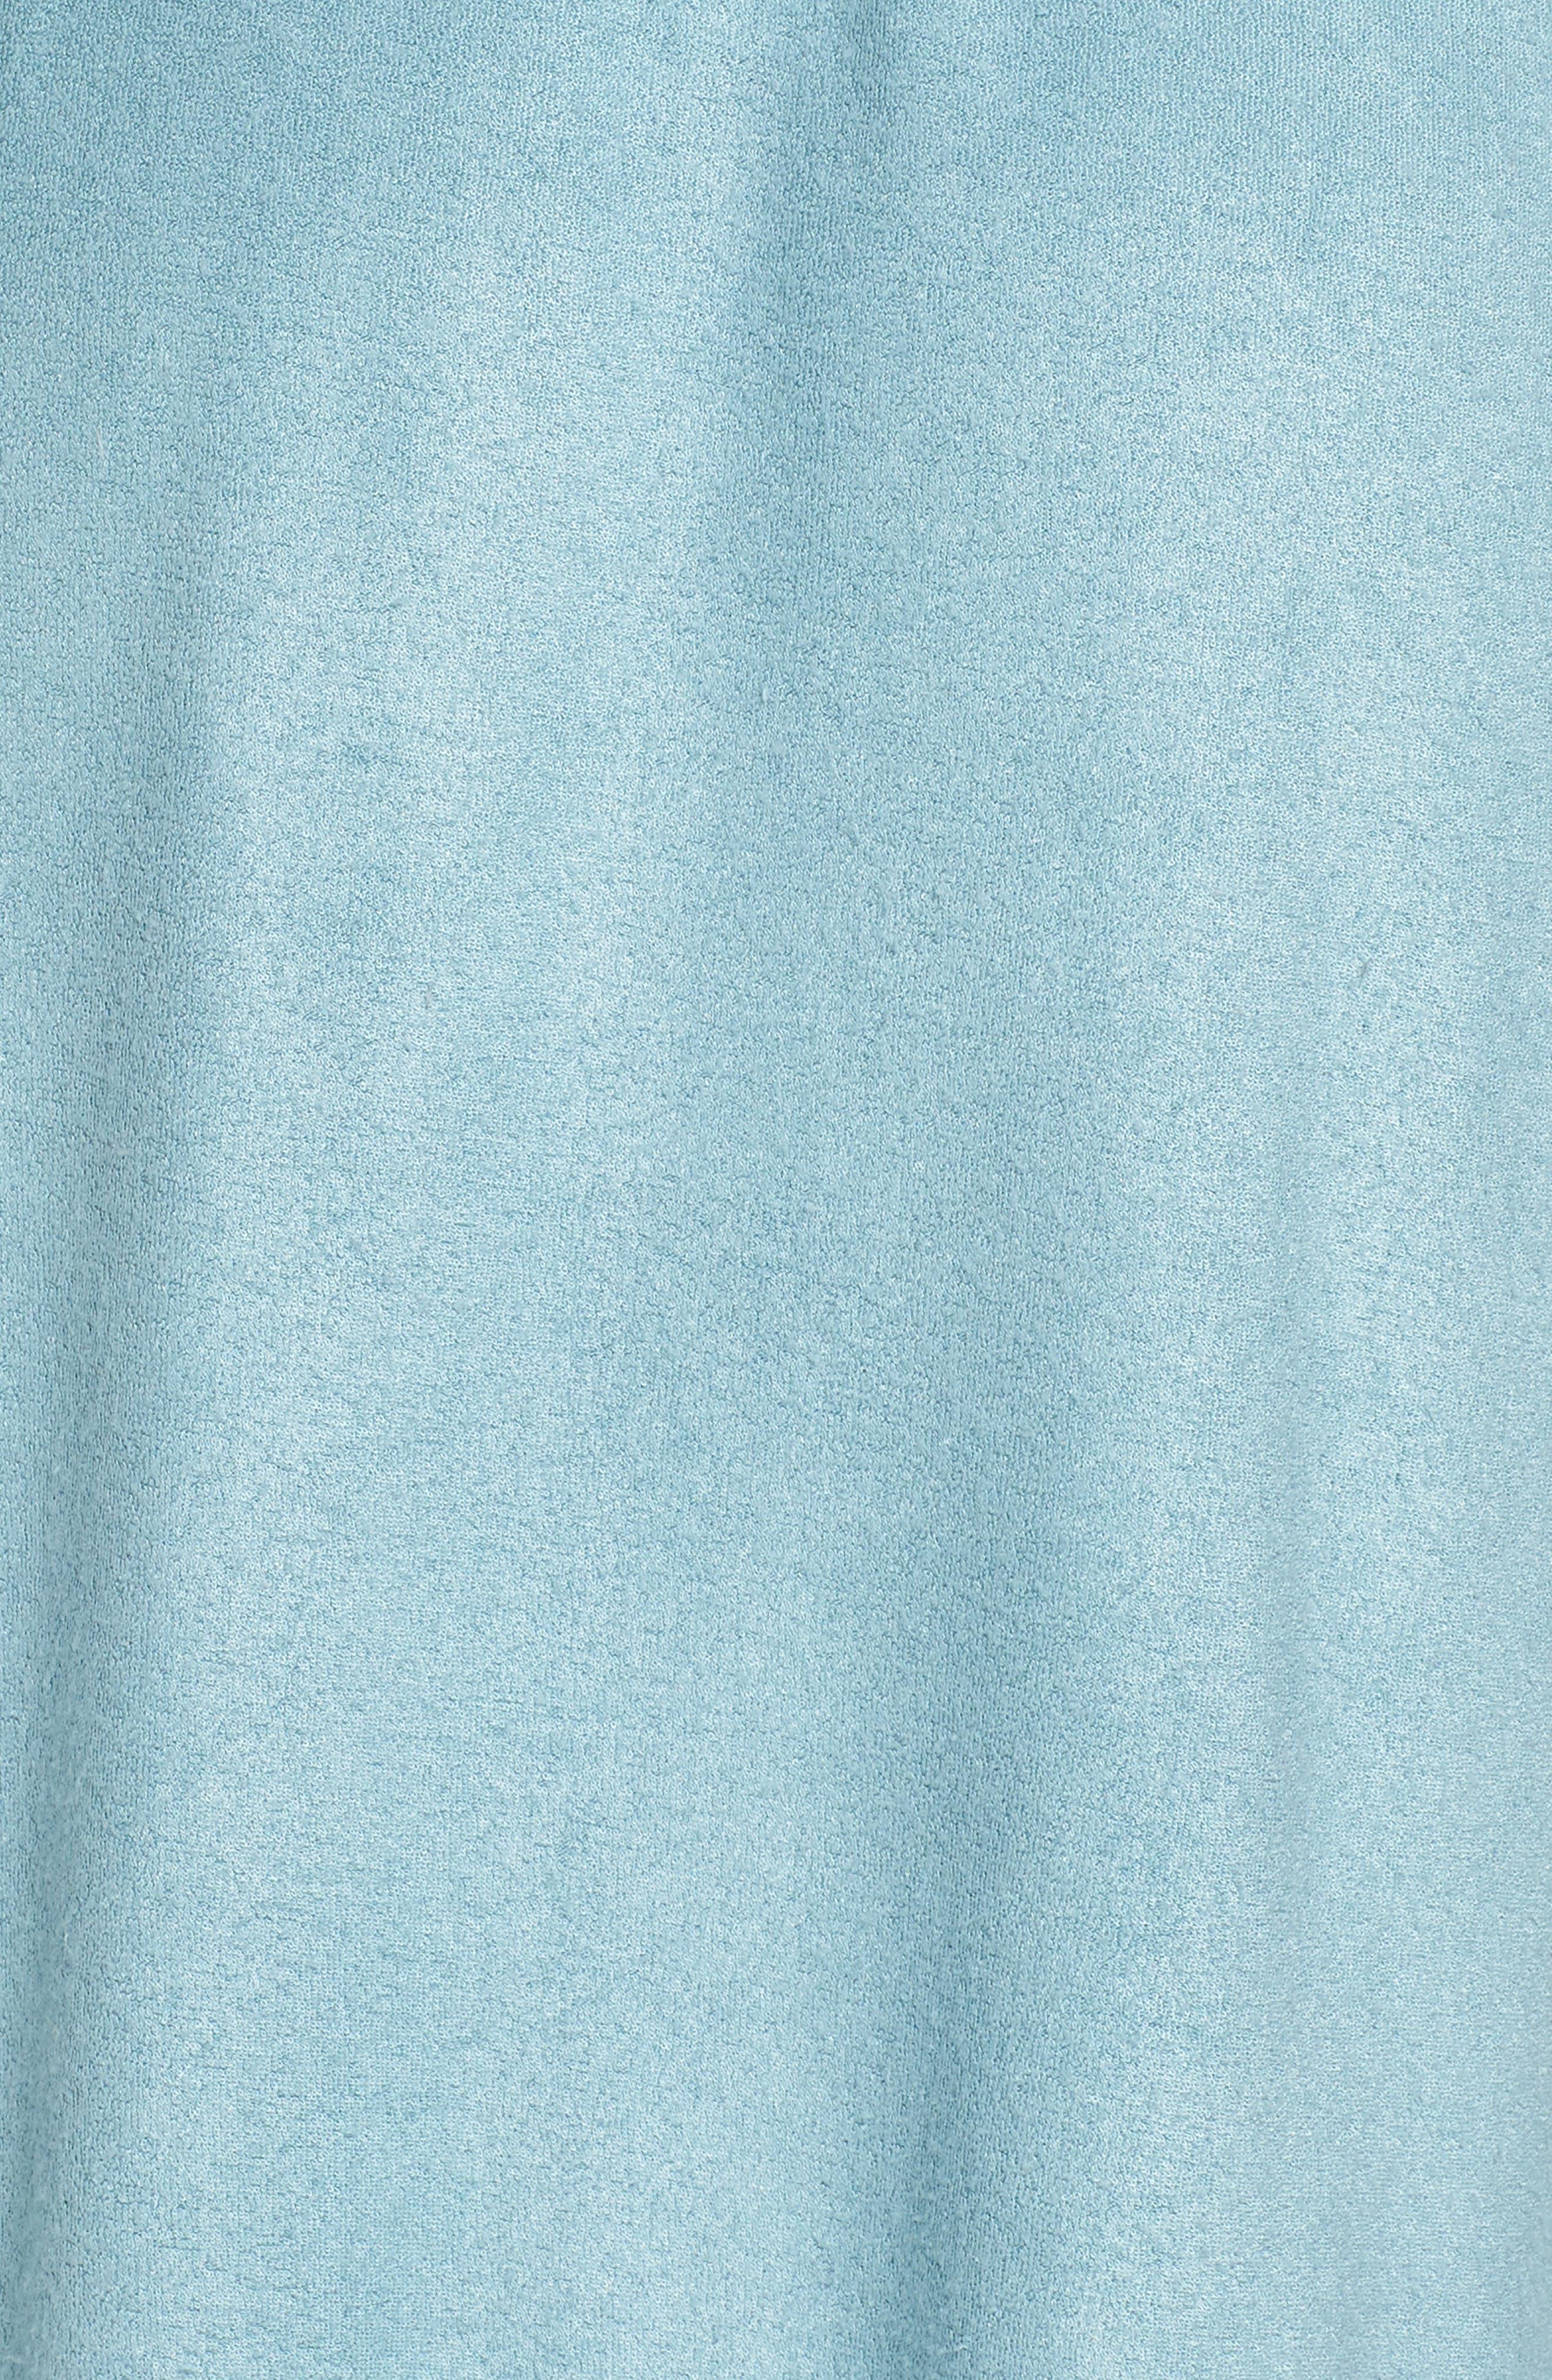 NATORI, Himalaya Brushed Terry Robe, Alternate thumbnail 5, color, 455